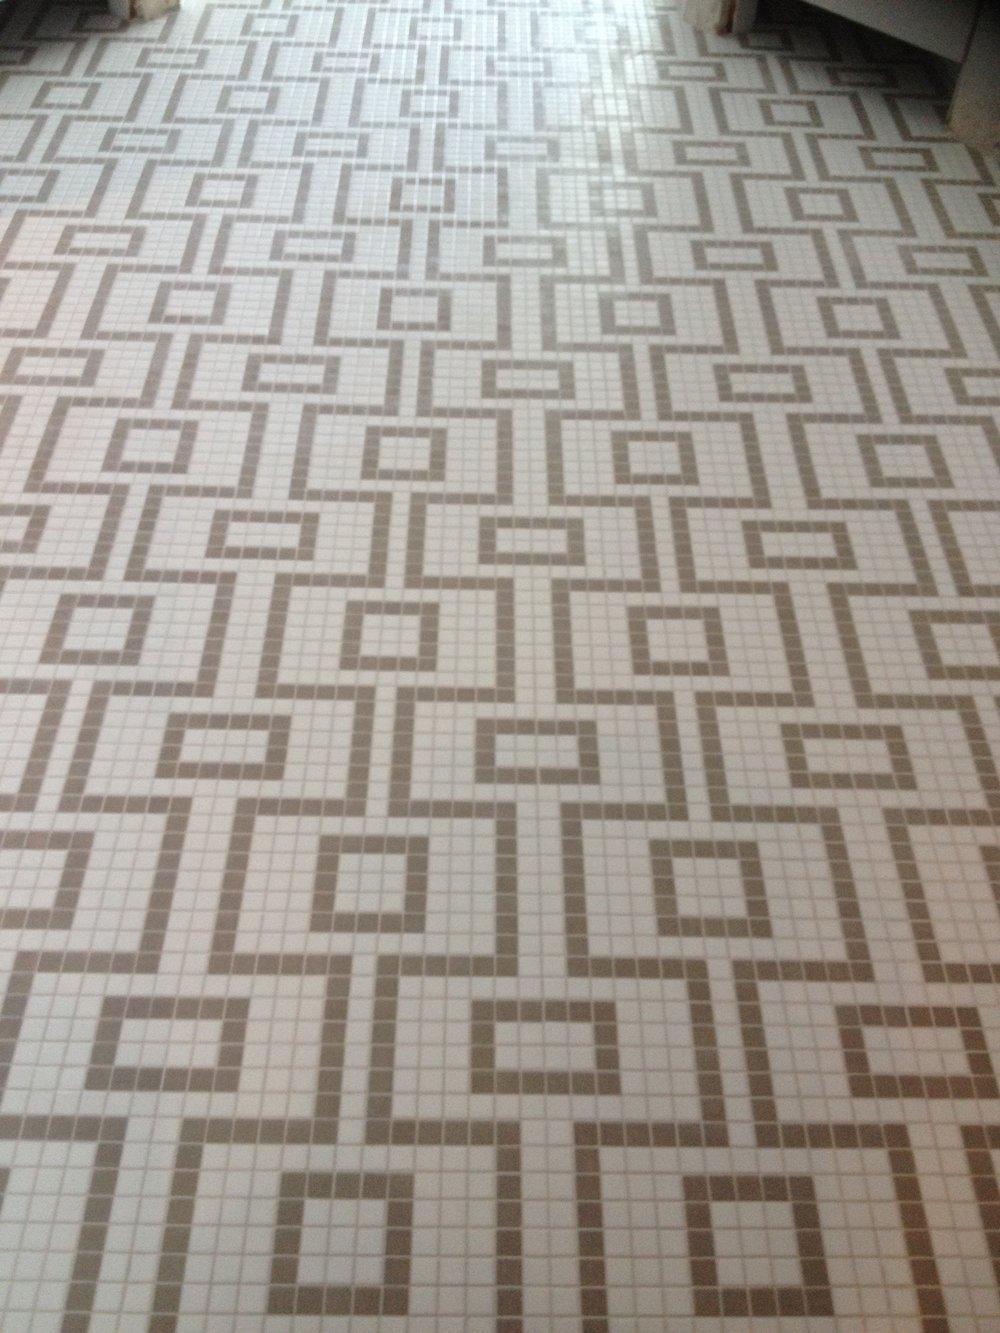 Stunning mosaic entrance floor tiling